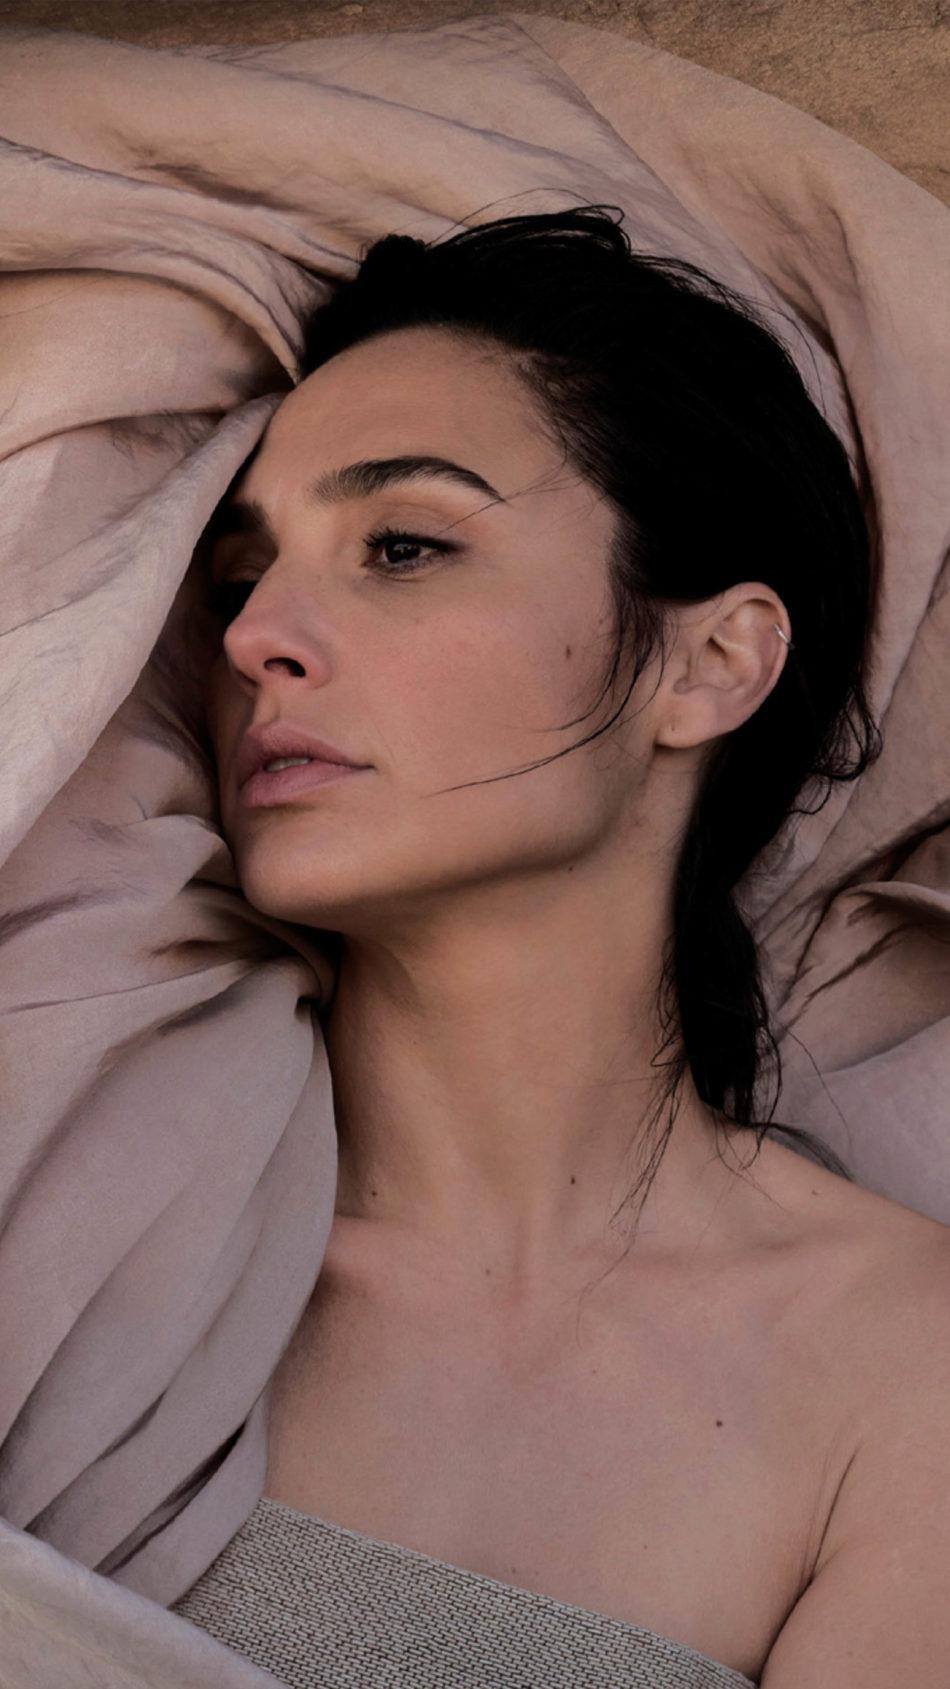 Gal Gadot Vogue 2020 Photoshoot 4K Ultra HD Mobile Wallpaper